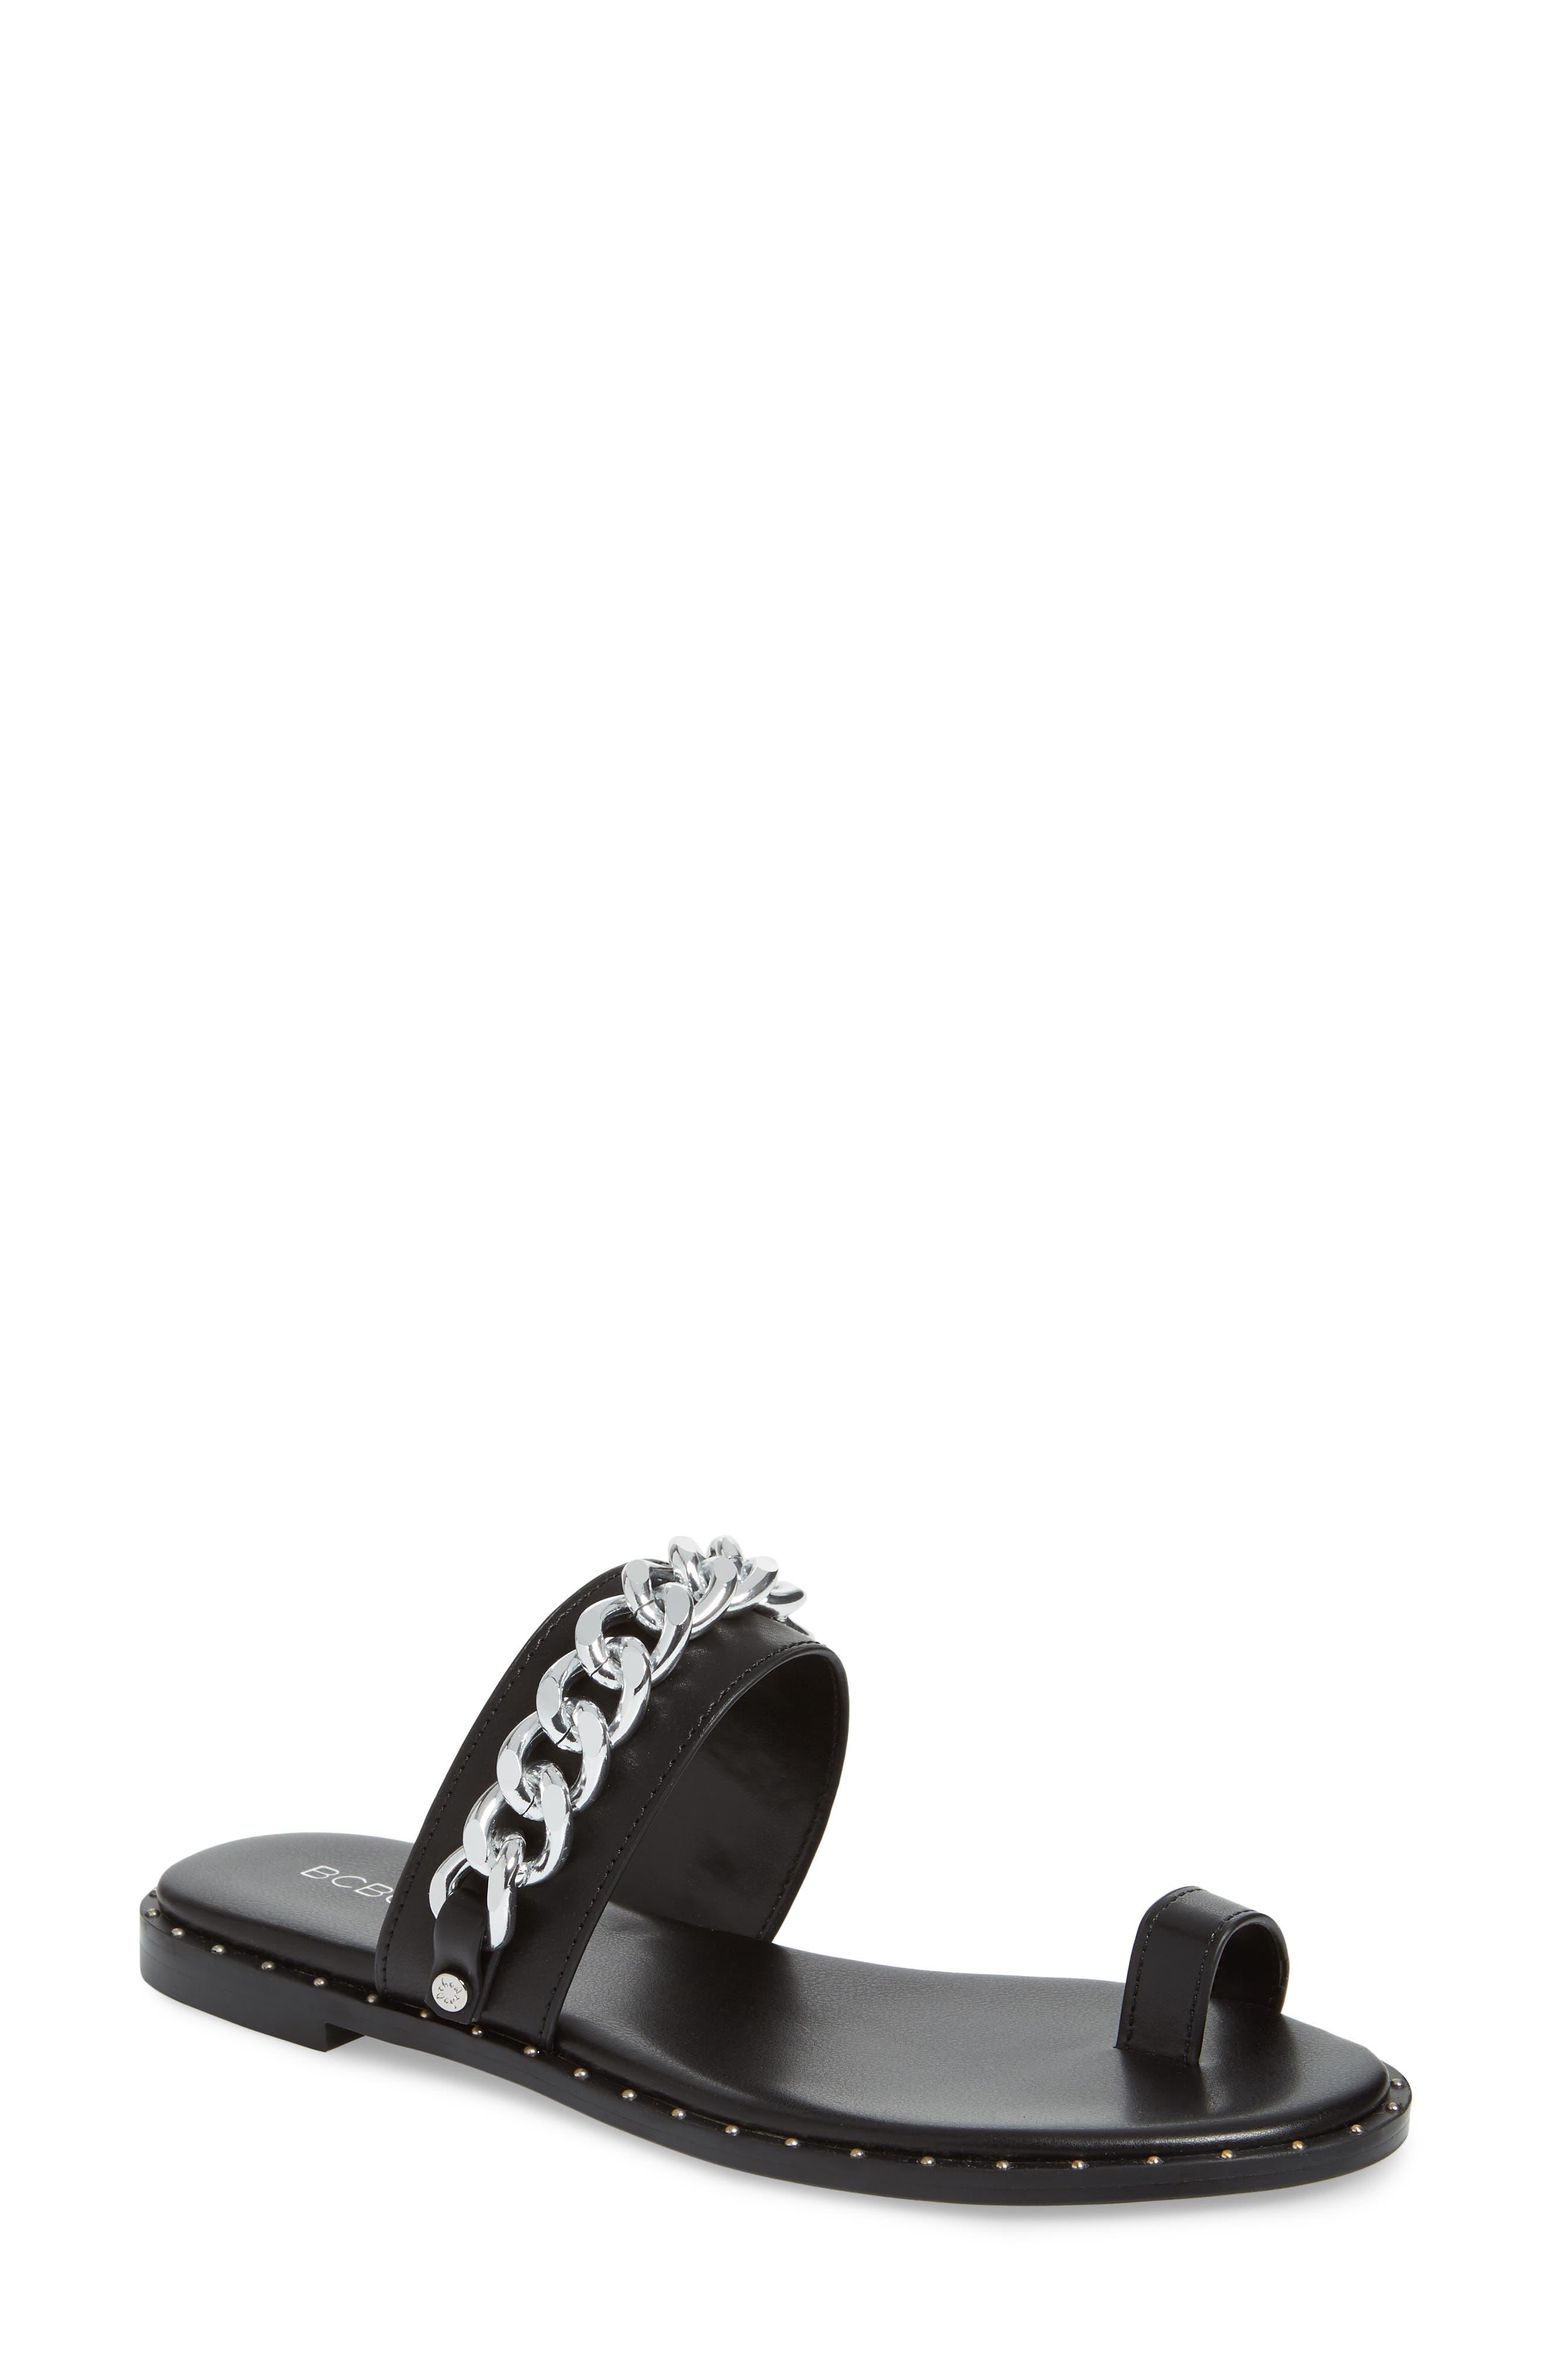 Zola Chain Slide Sandal, Main, color, 001